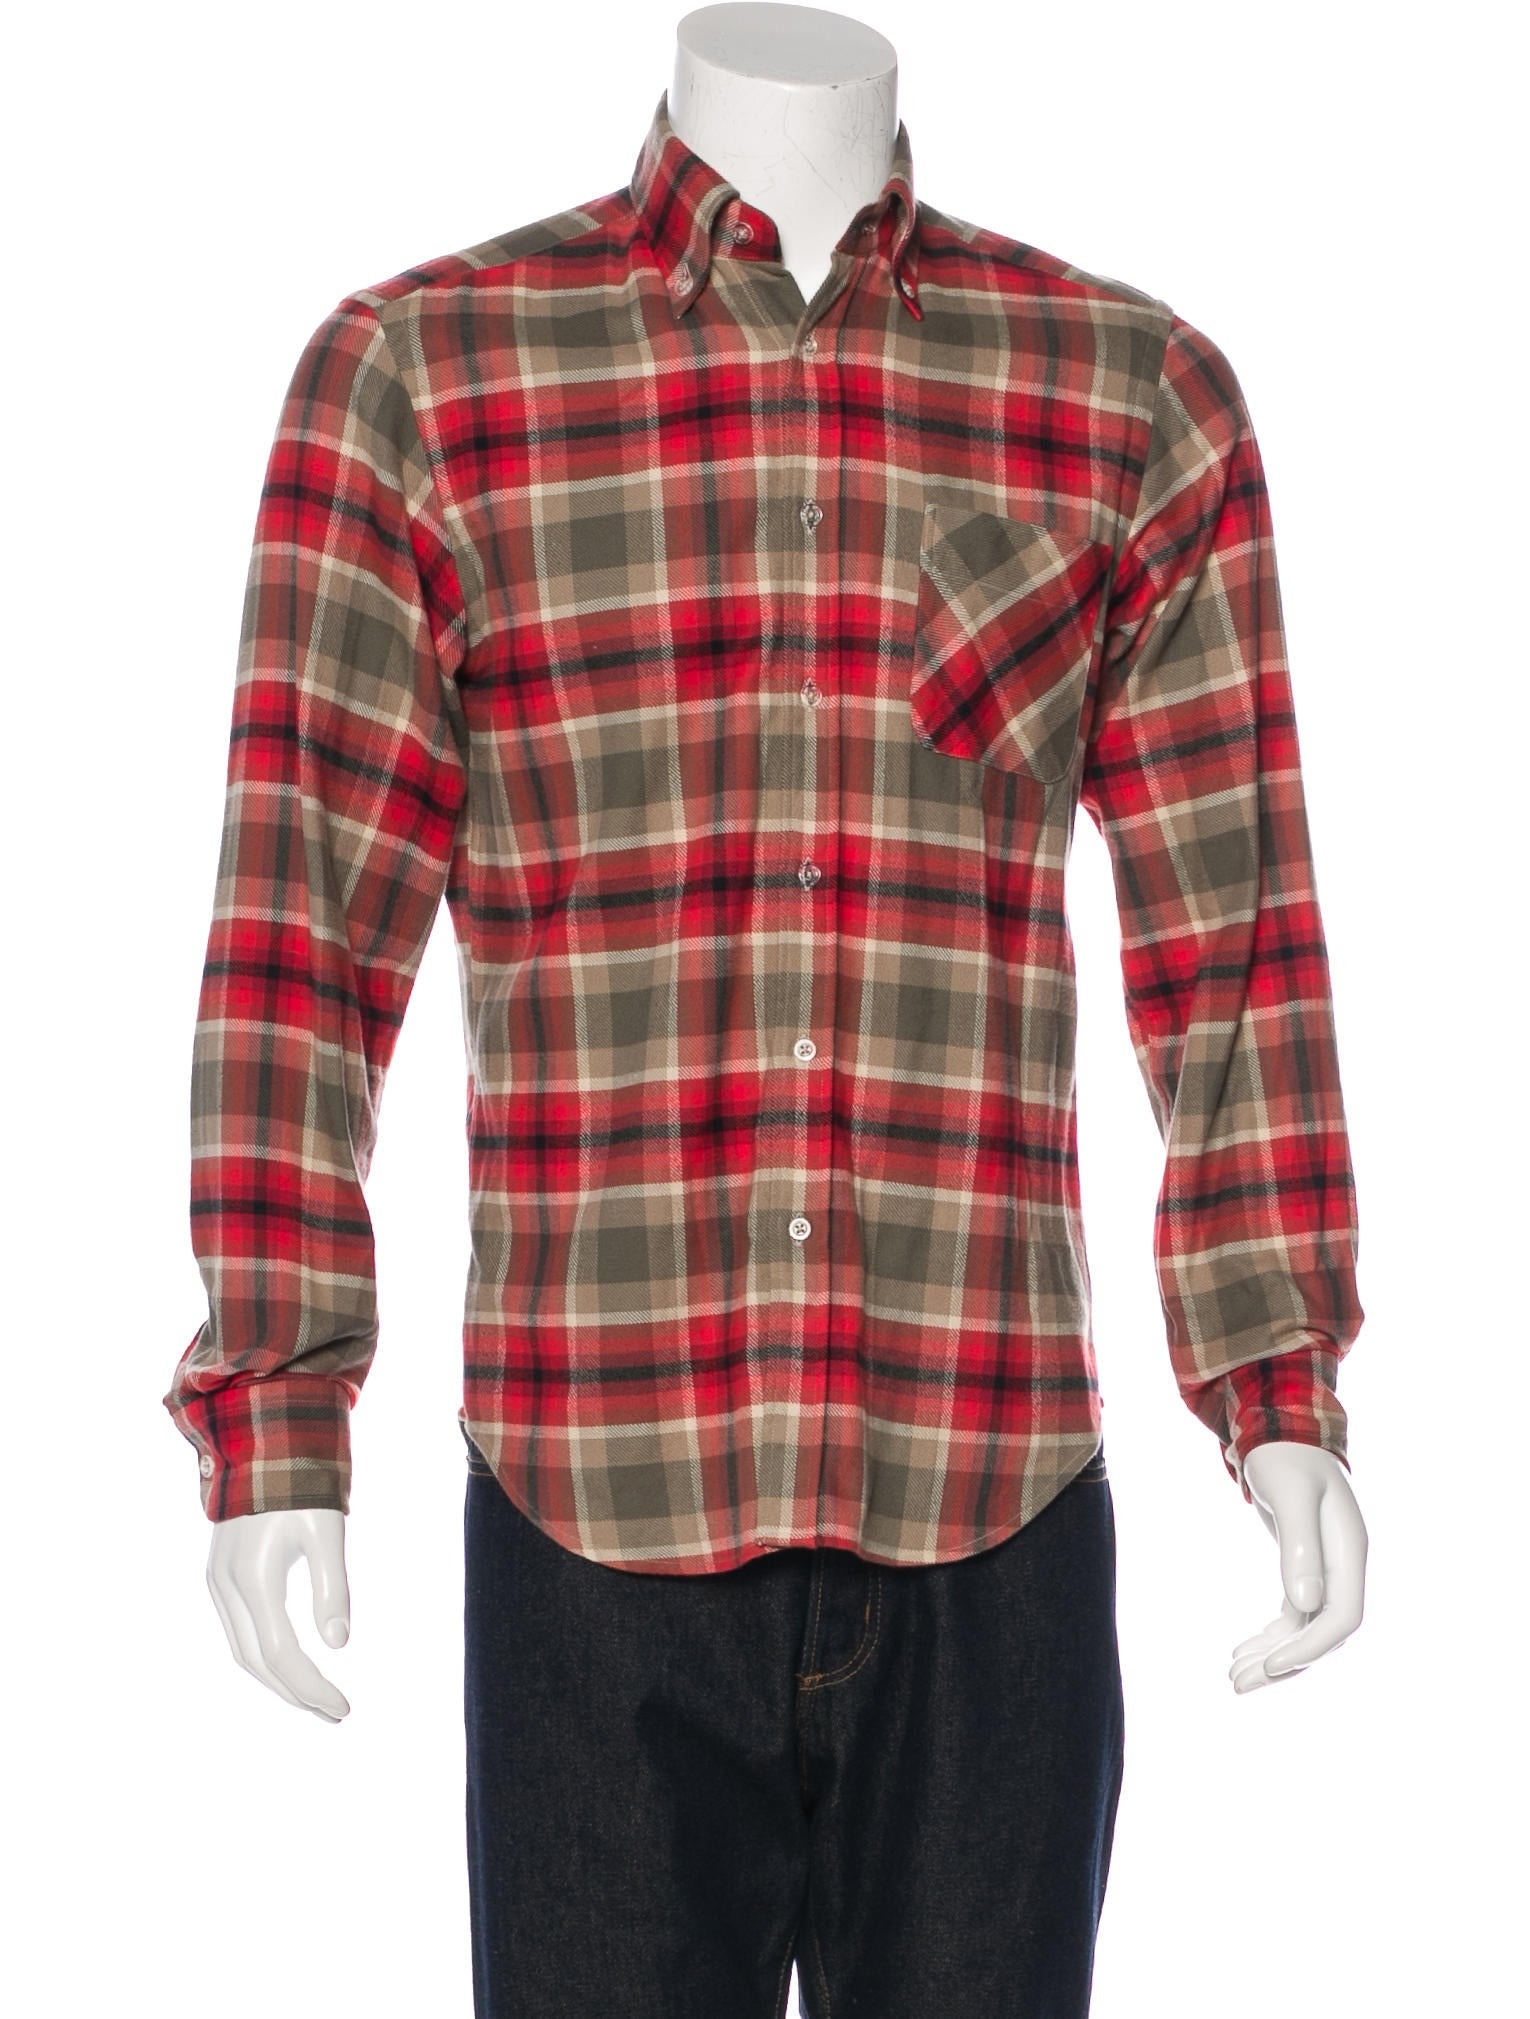 Adam kimmel plaid flannel shirt clothing adk20049 for Black watch plaid flannel shirt